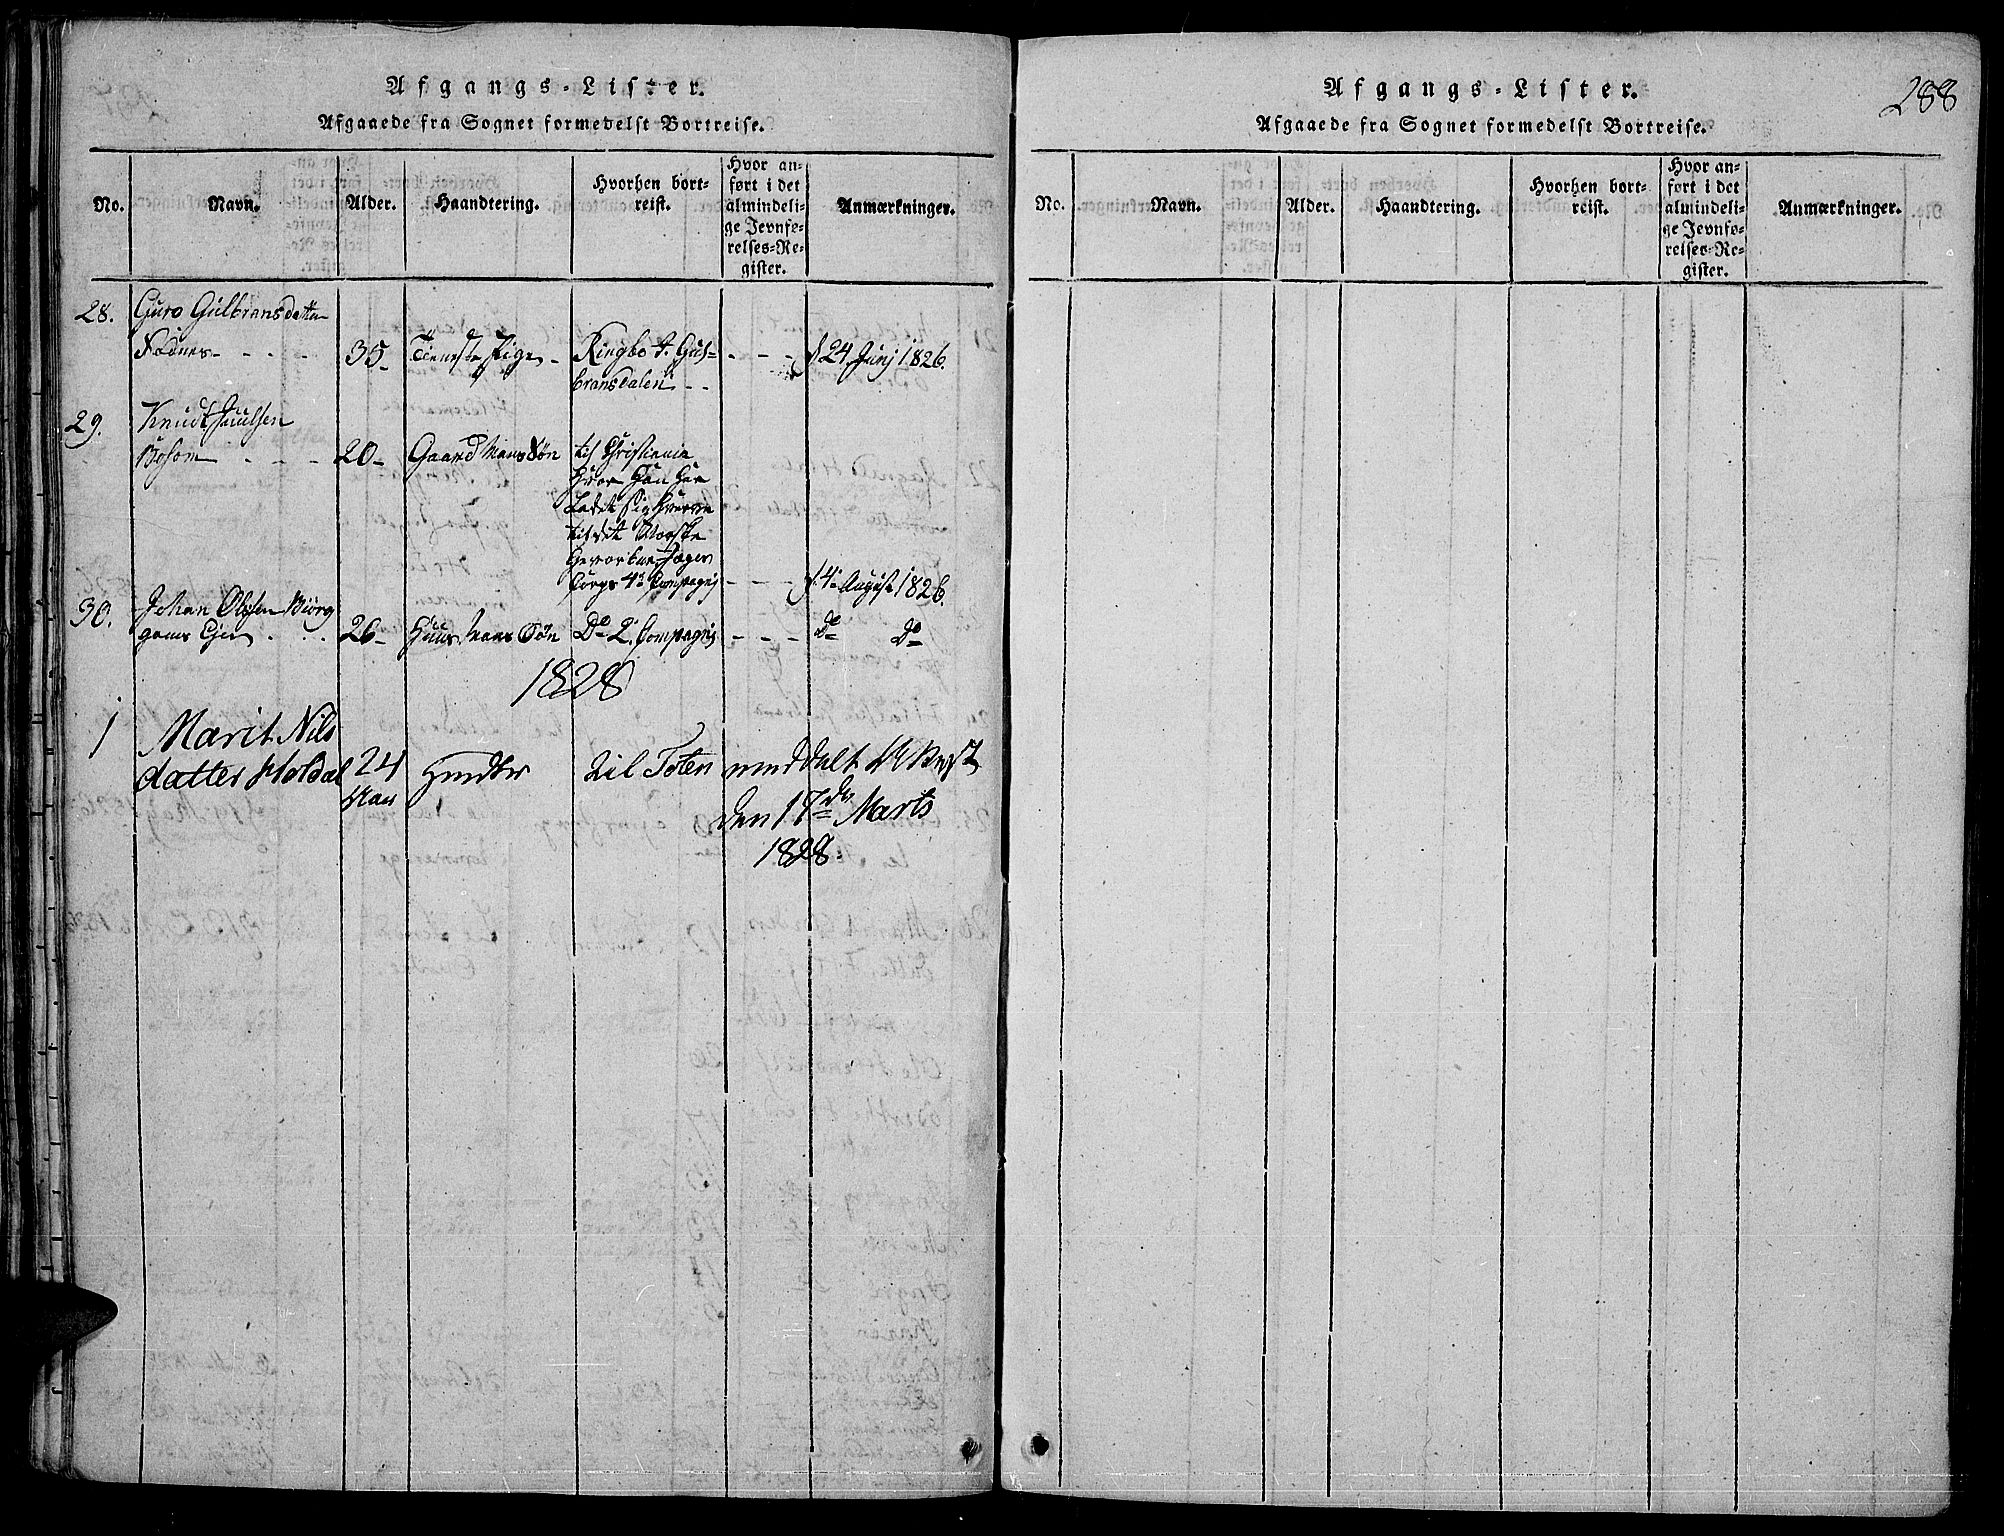 SAH, Nord-Aurdal prestekontor, Ministerialbok nr. 2, 1816-1828, s. 288